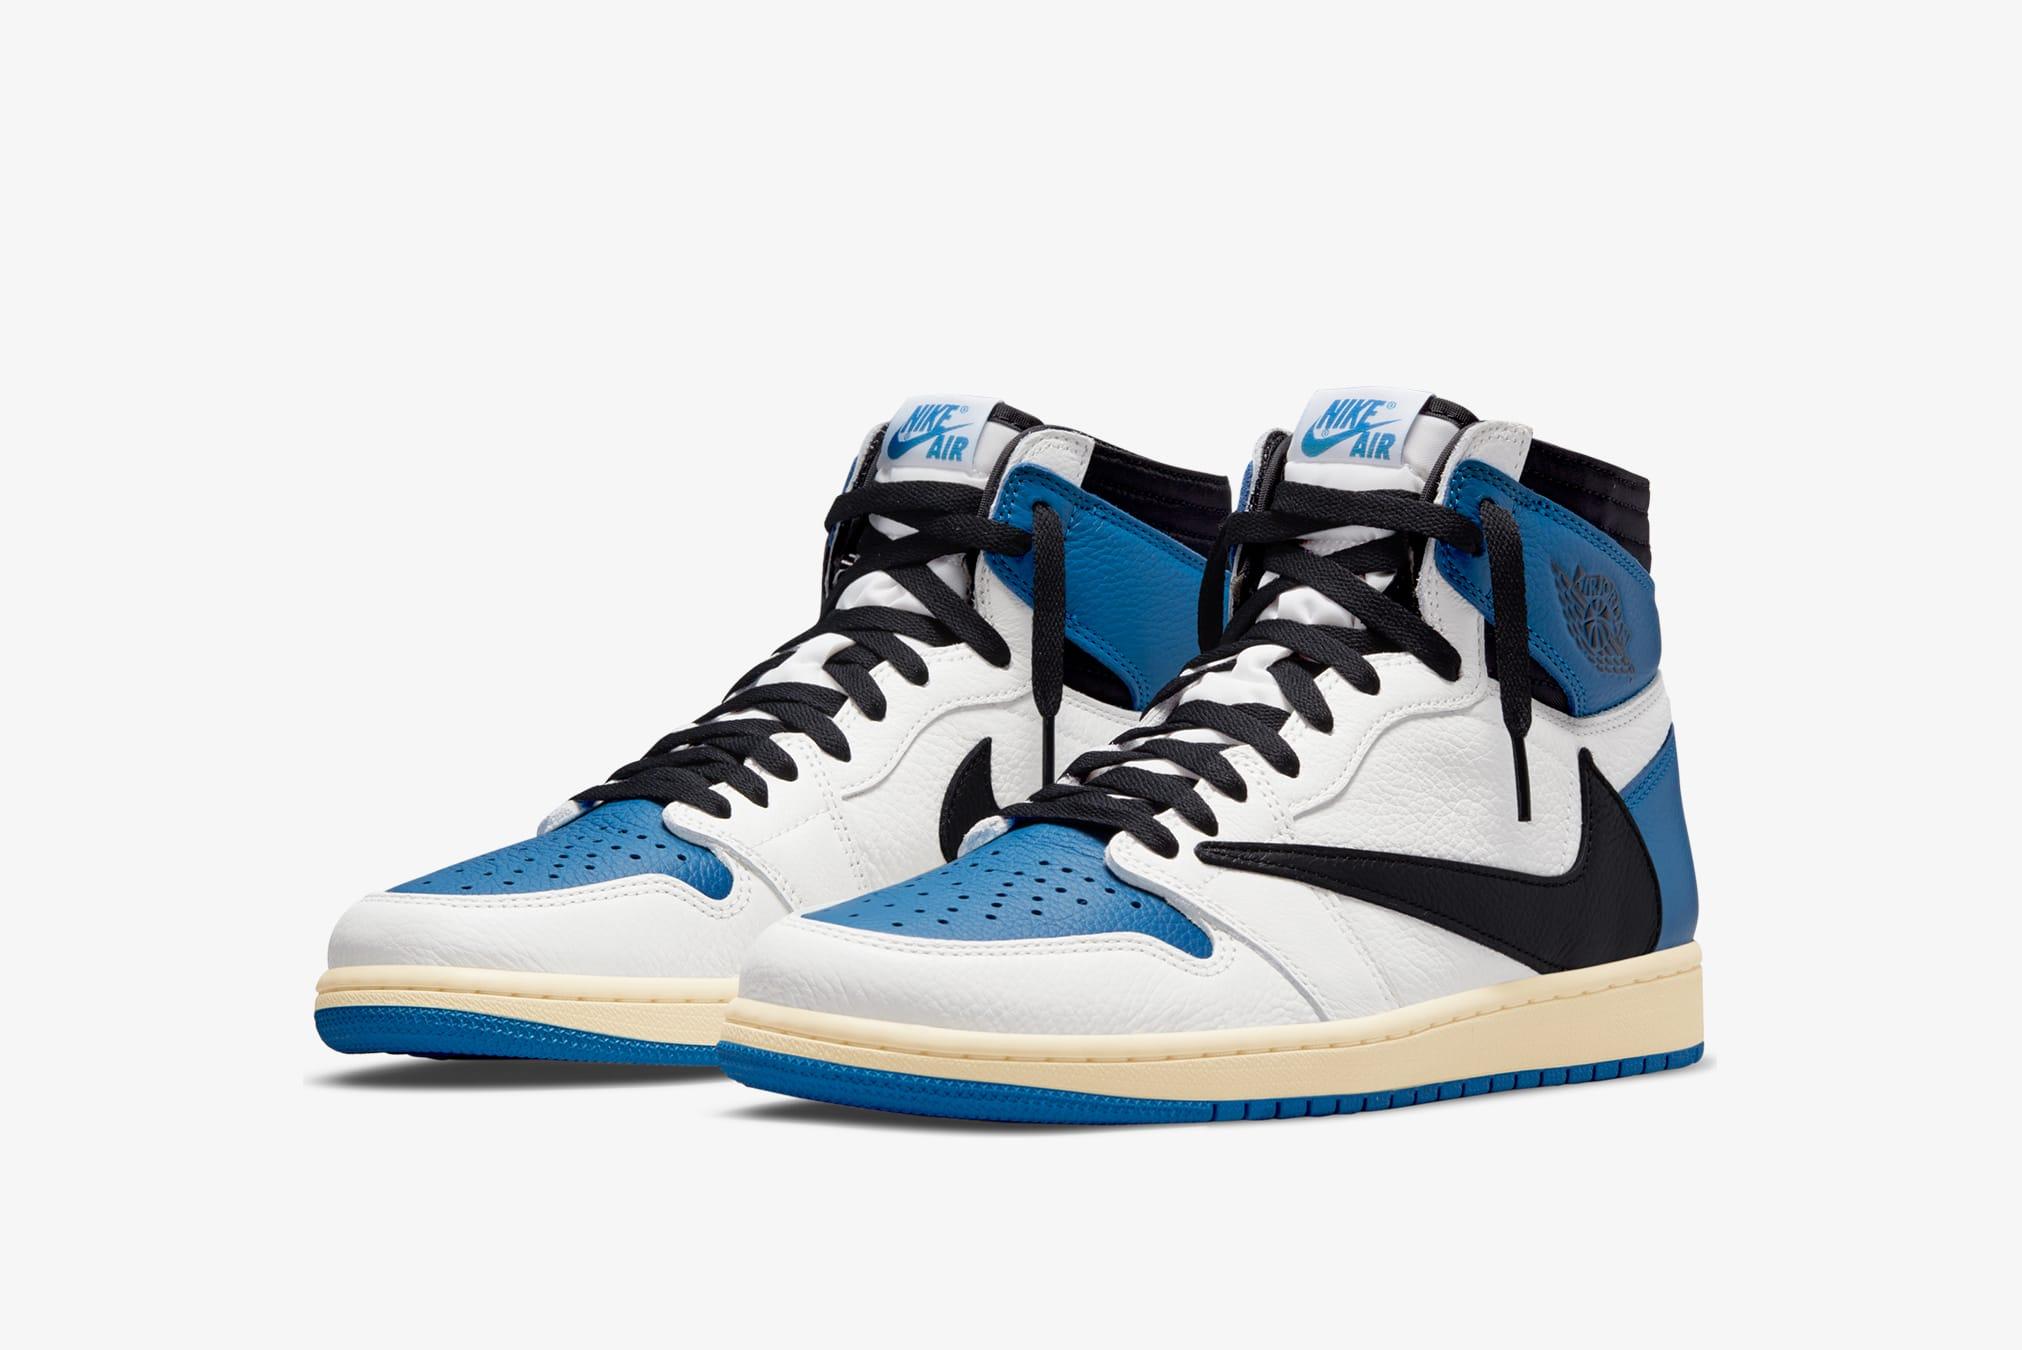 Nike x Fragment Design x Travis Scott Air Jordan 1 Retro High OG - DH3227-105